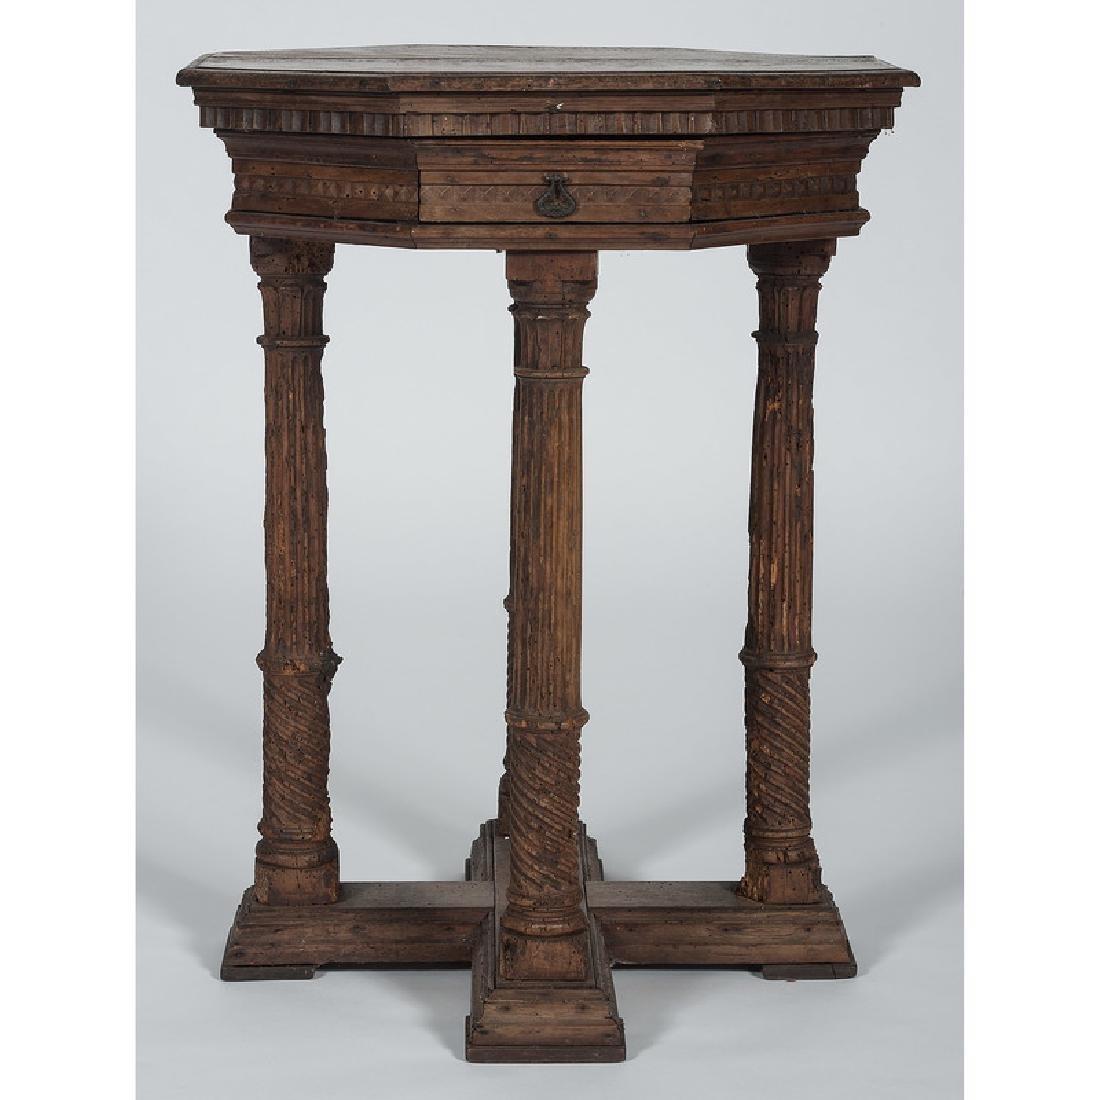 Italian Renaissance-style Octagonal Side Table